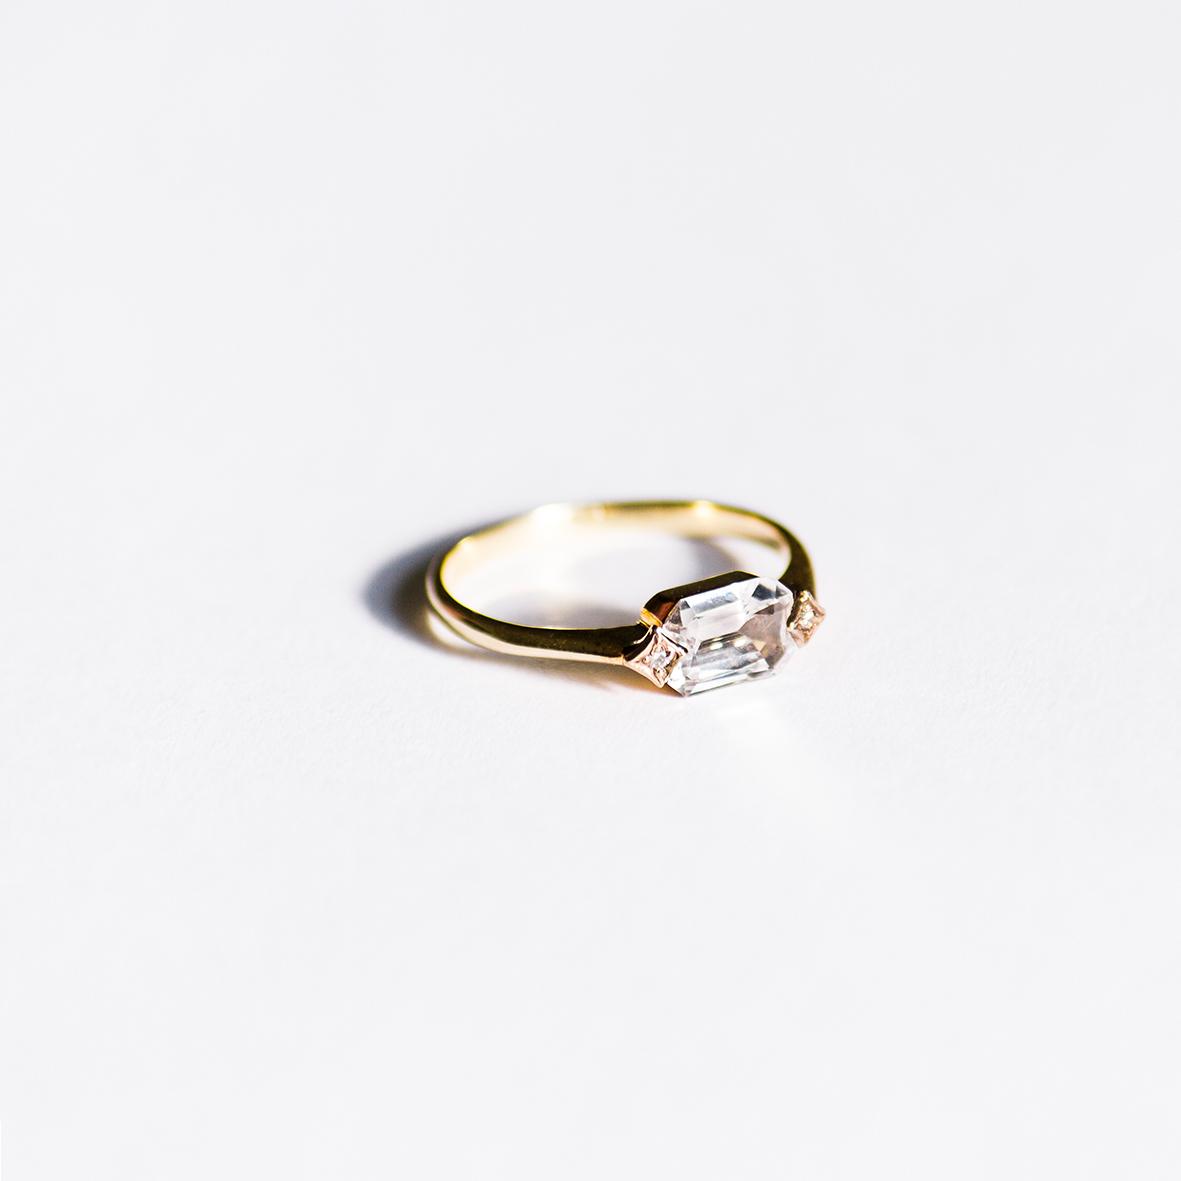 5. OONA_engagement_ficha1_single sapphire ring copia